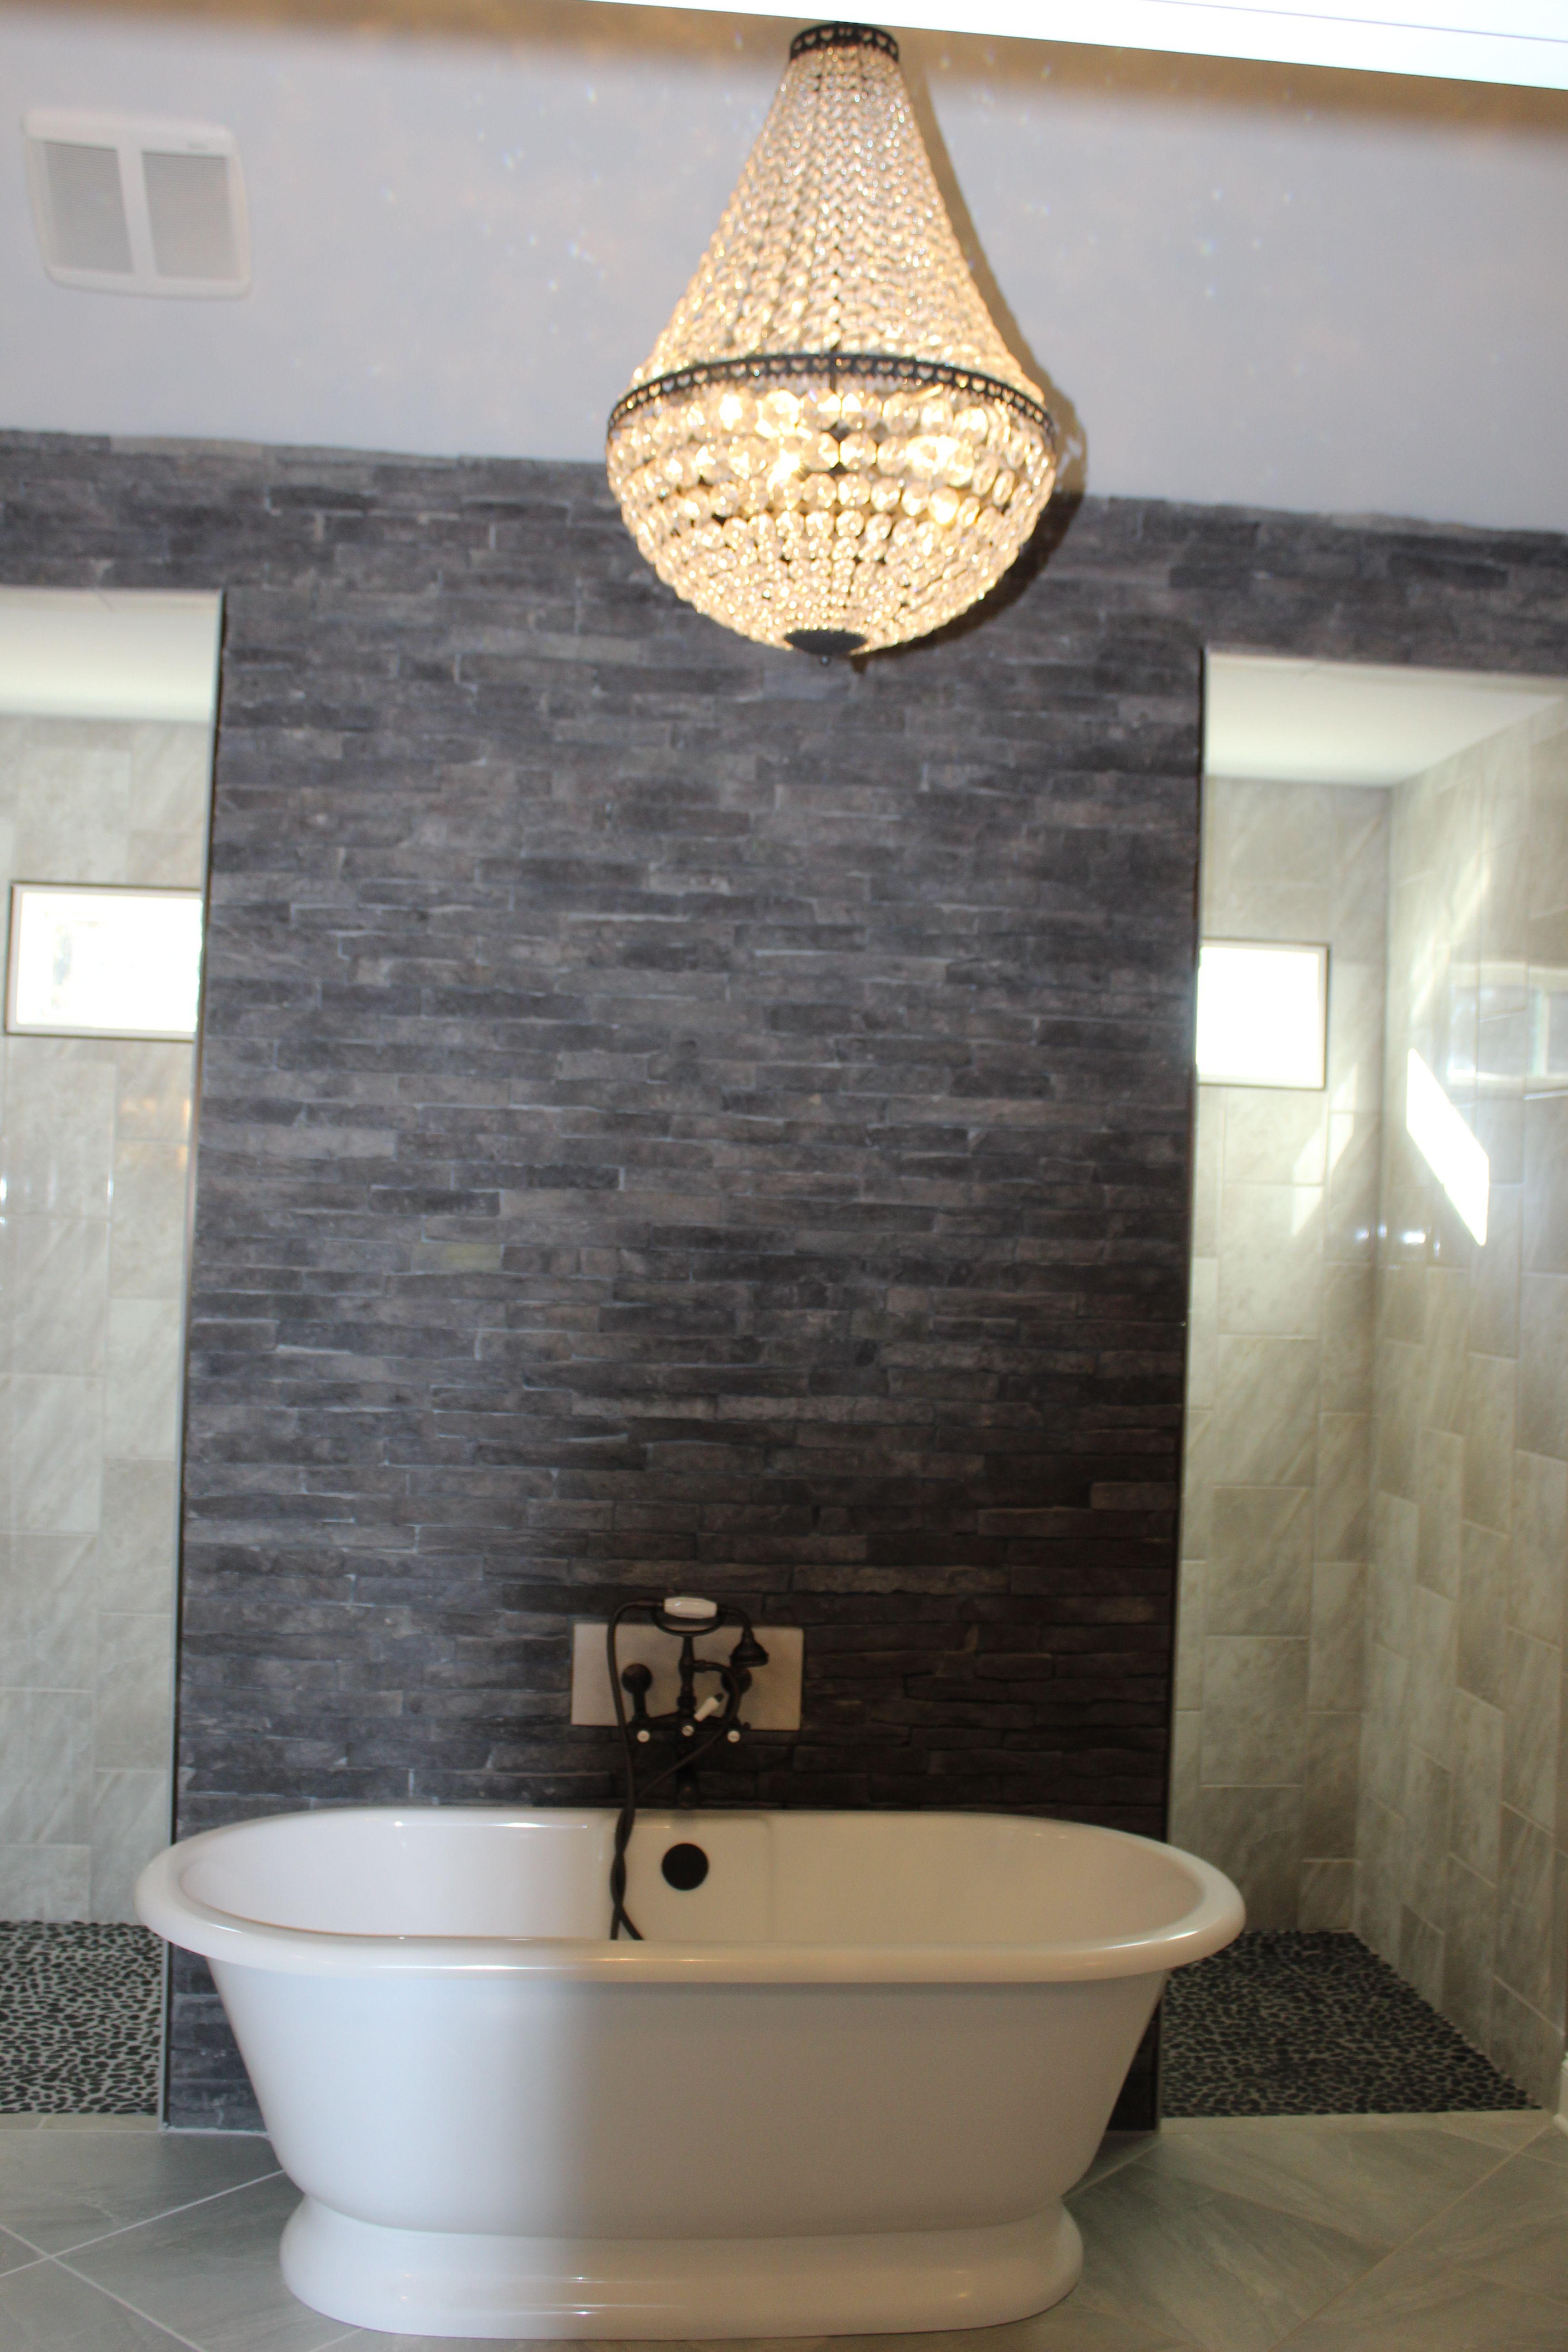 malibu and bathroom vanity onsingularity com with bathtub single gray bath cabinet side tags modern inch top